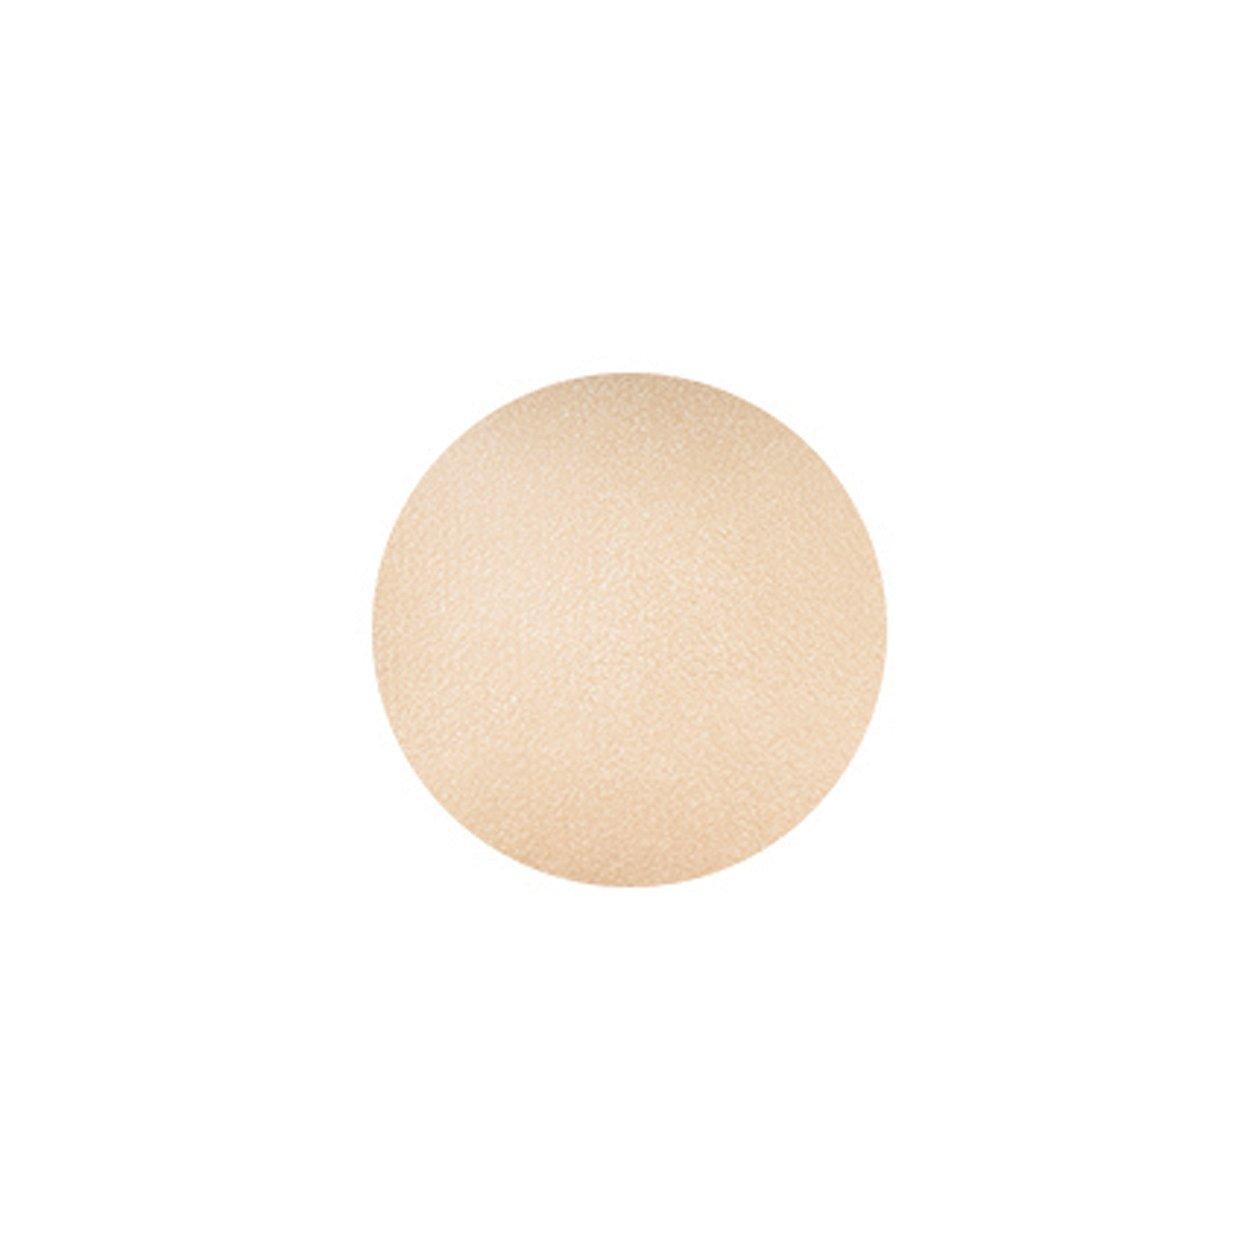 Hourglass Ambient® Lighting Powder - Diffused Light B00B195HWK